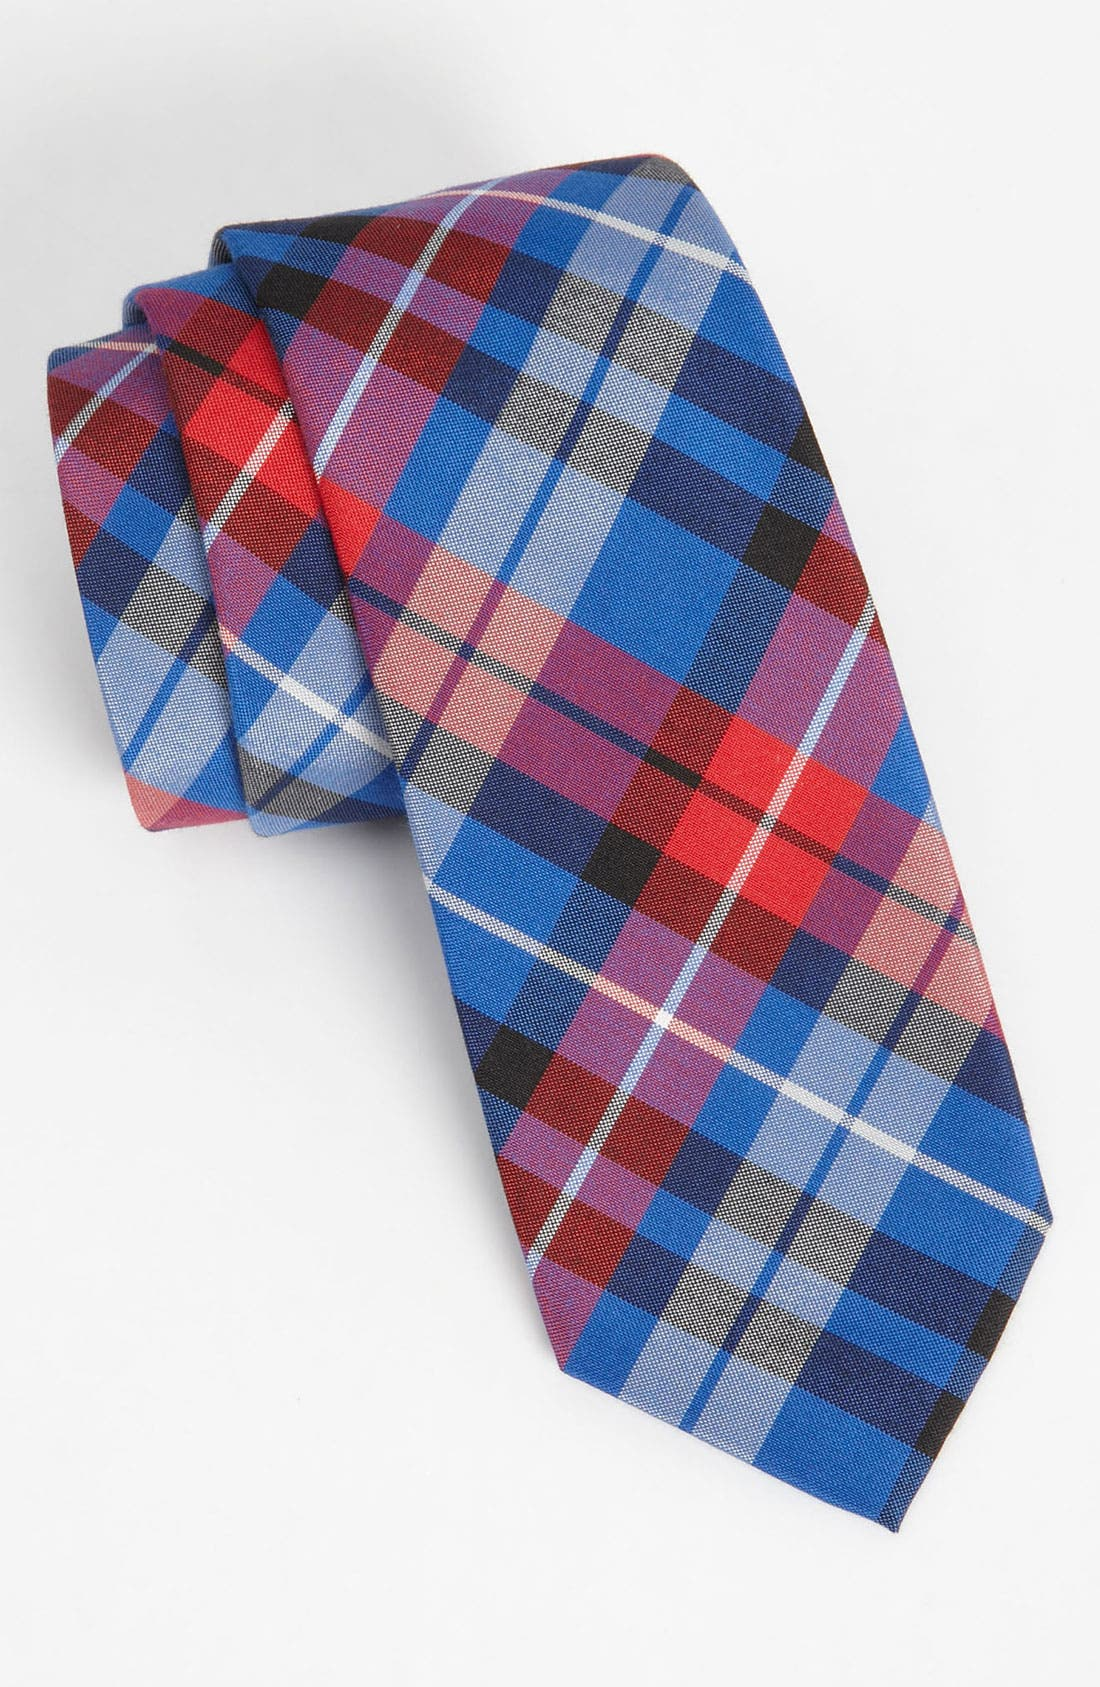 Main Image - Public Opinion Woven Tie